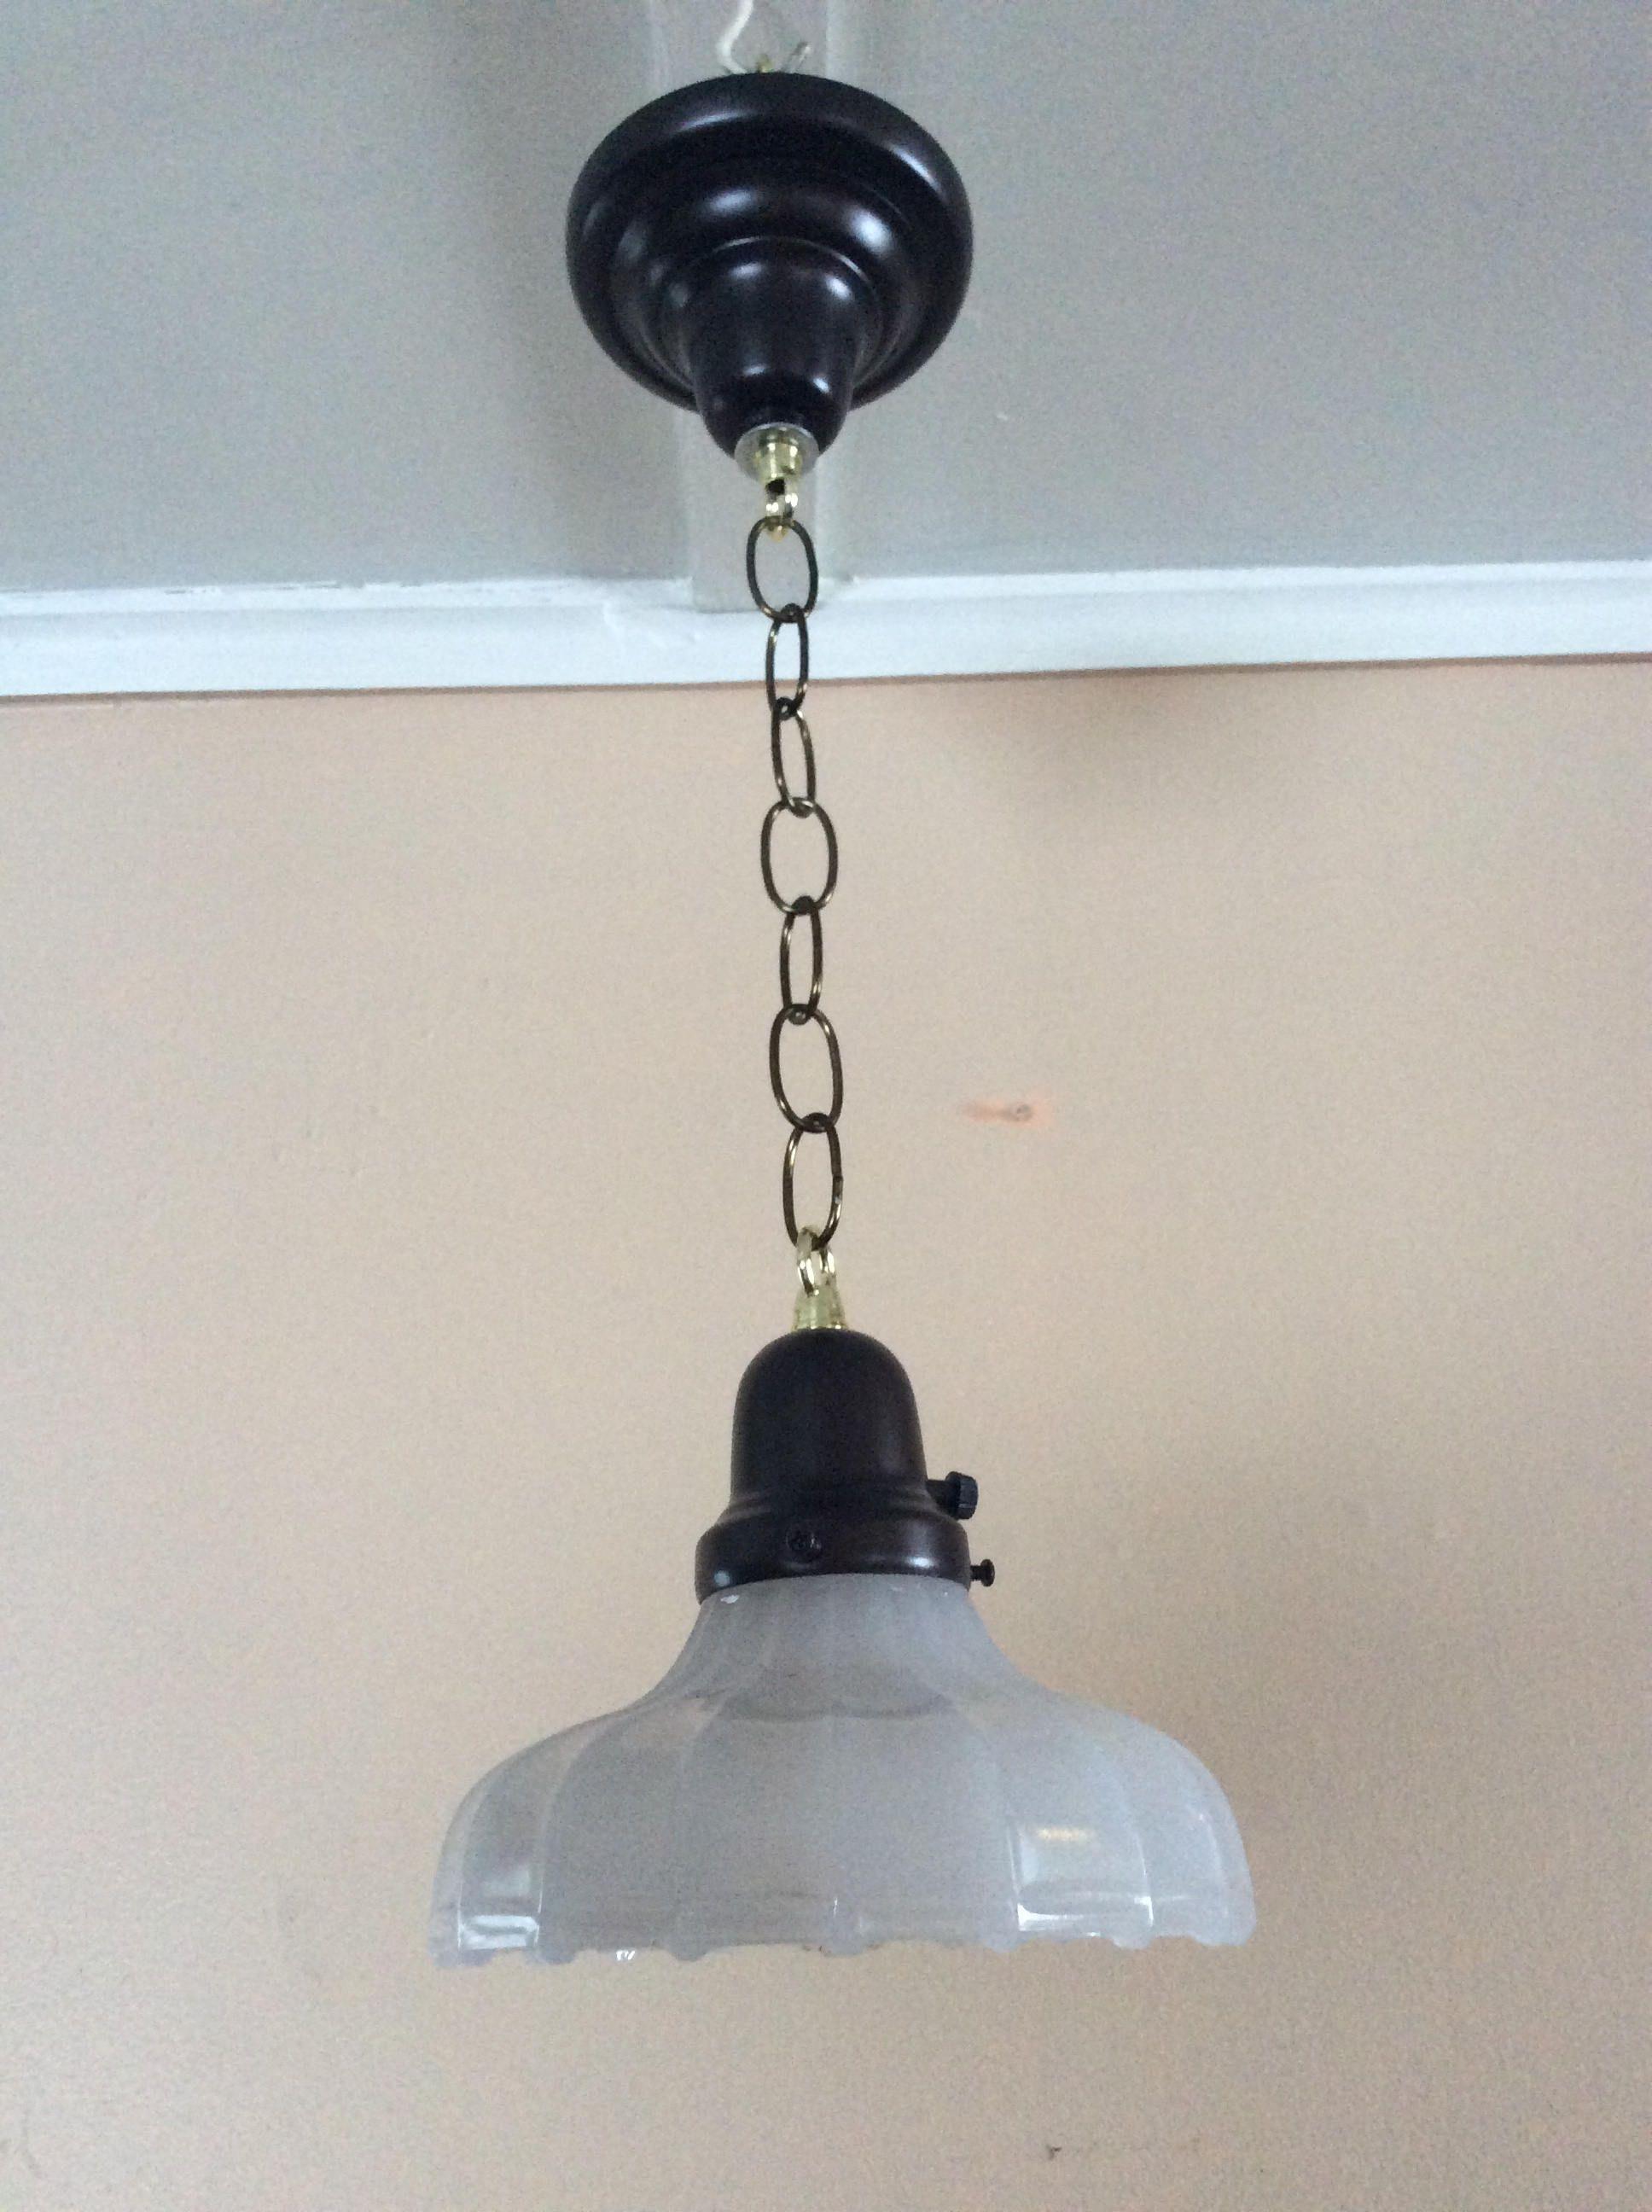 Vintage White Clam Scalloped Pendant Light 1930s Sheffield Style Pendant Light Old Lights Light